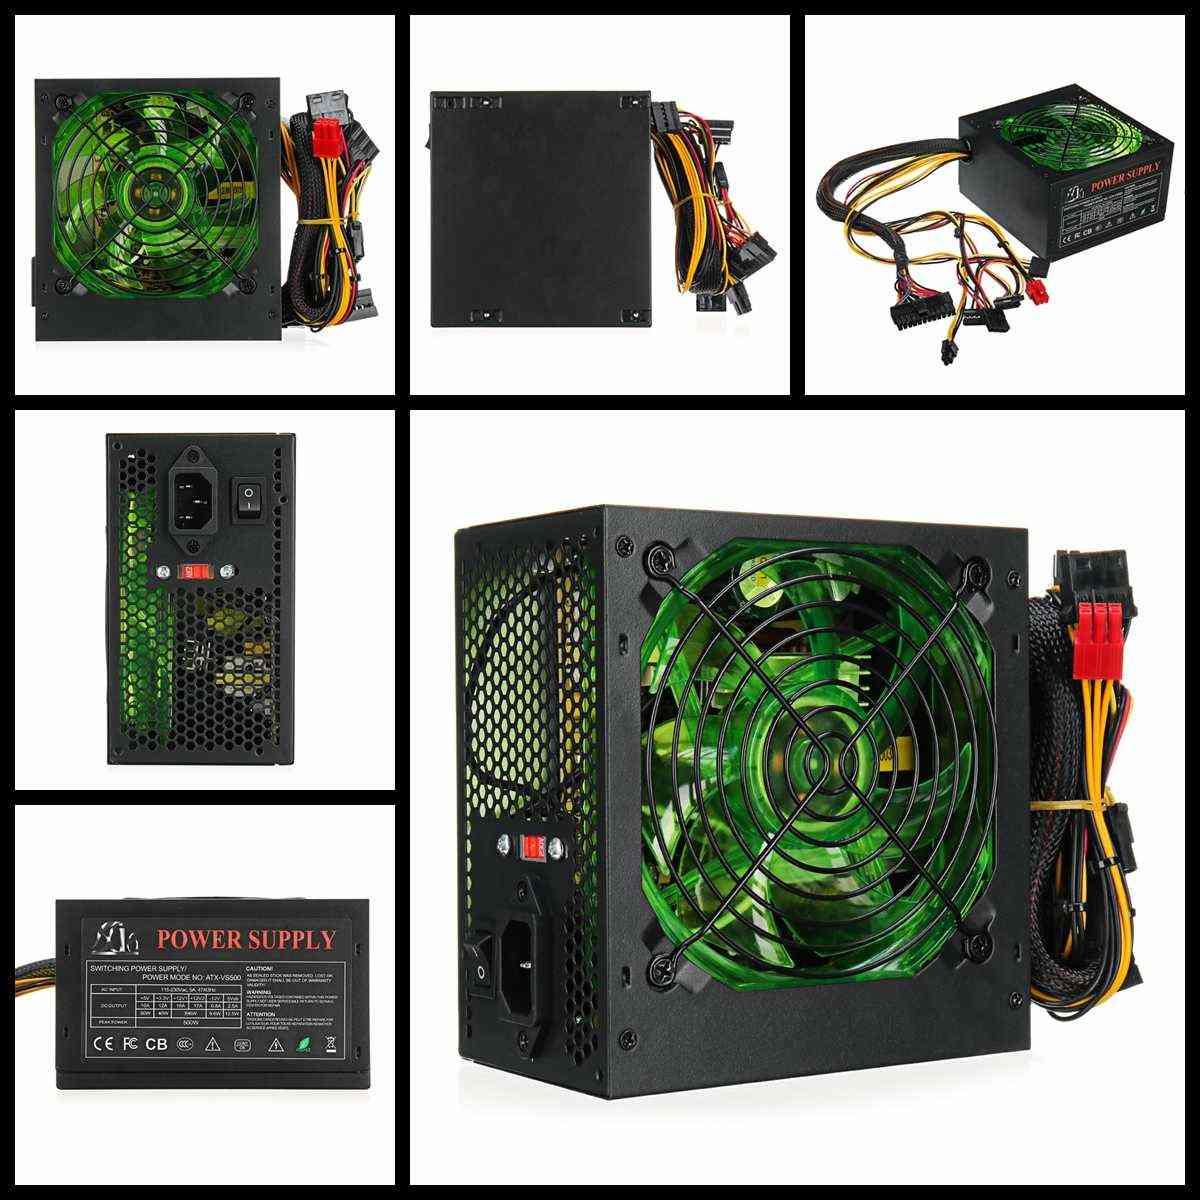 500w Pc Power Supply, 120mm Led Fan 24 Pin Pci Sata Atx 12v ,110220v For Desktop Gaming